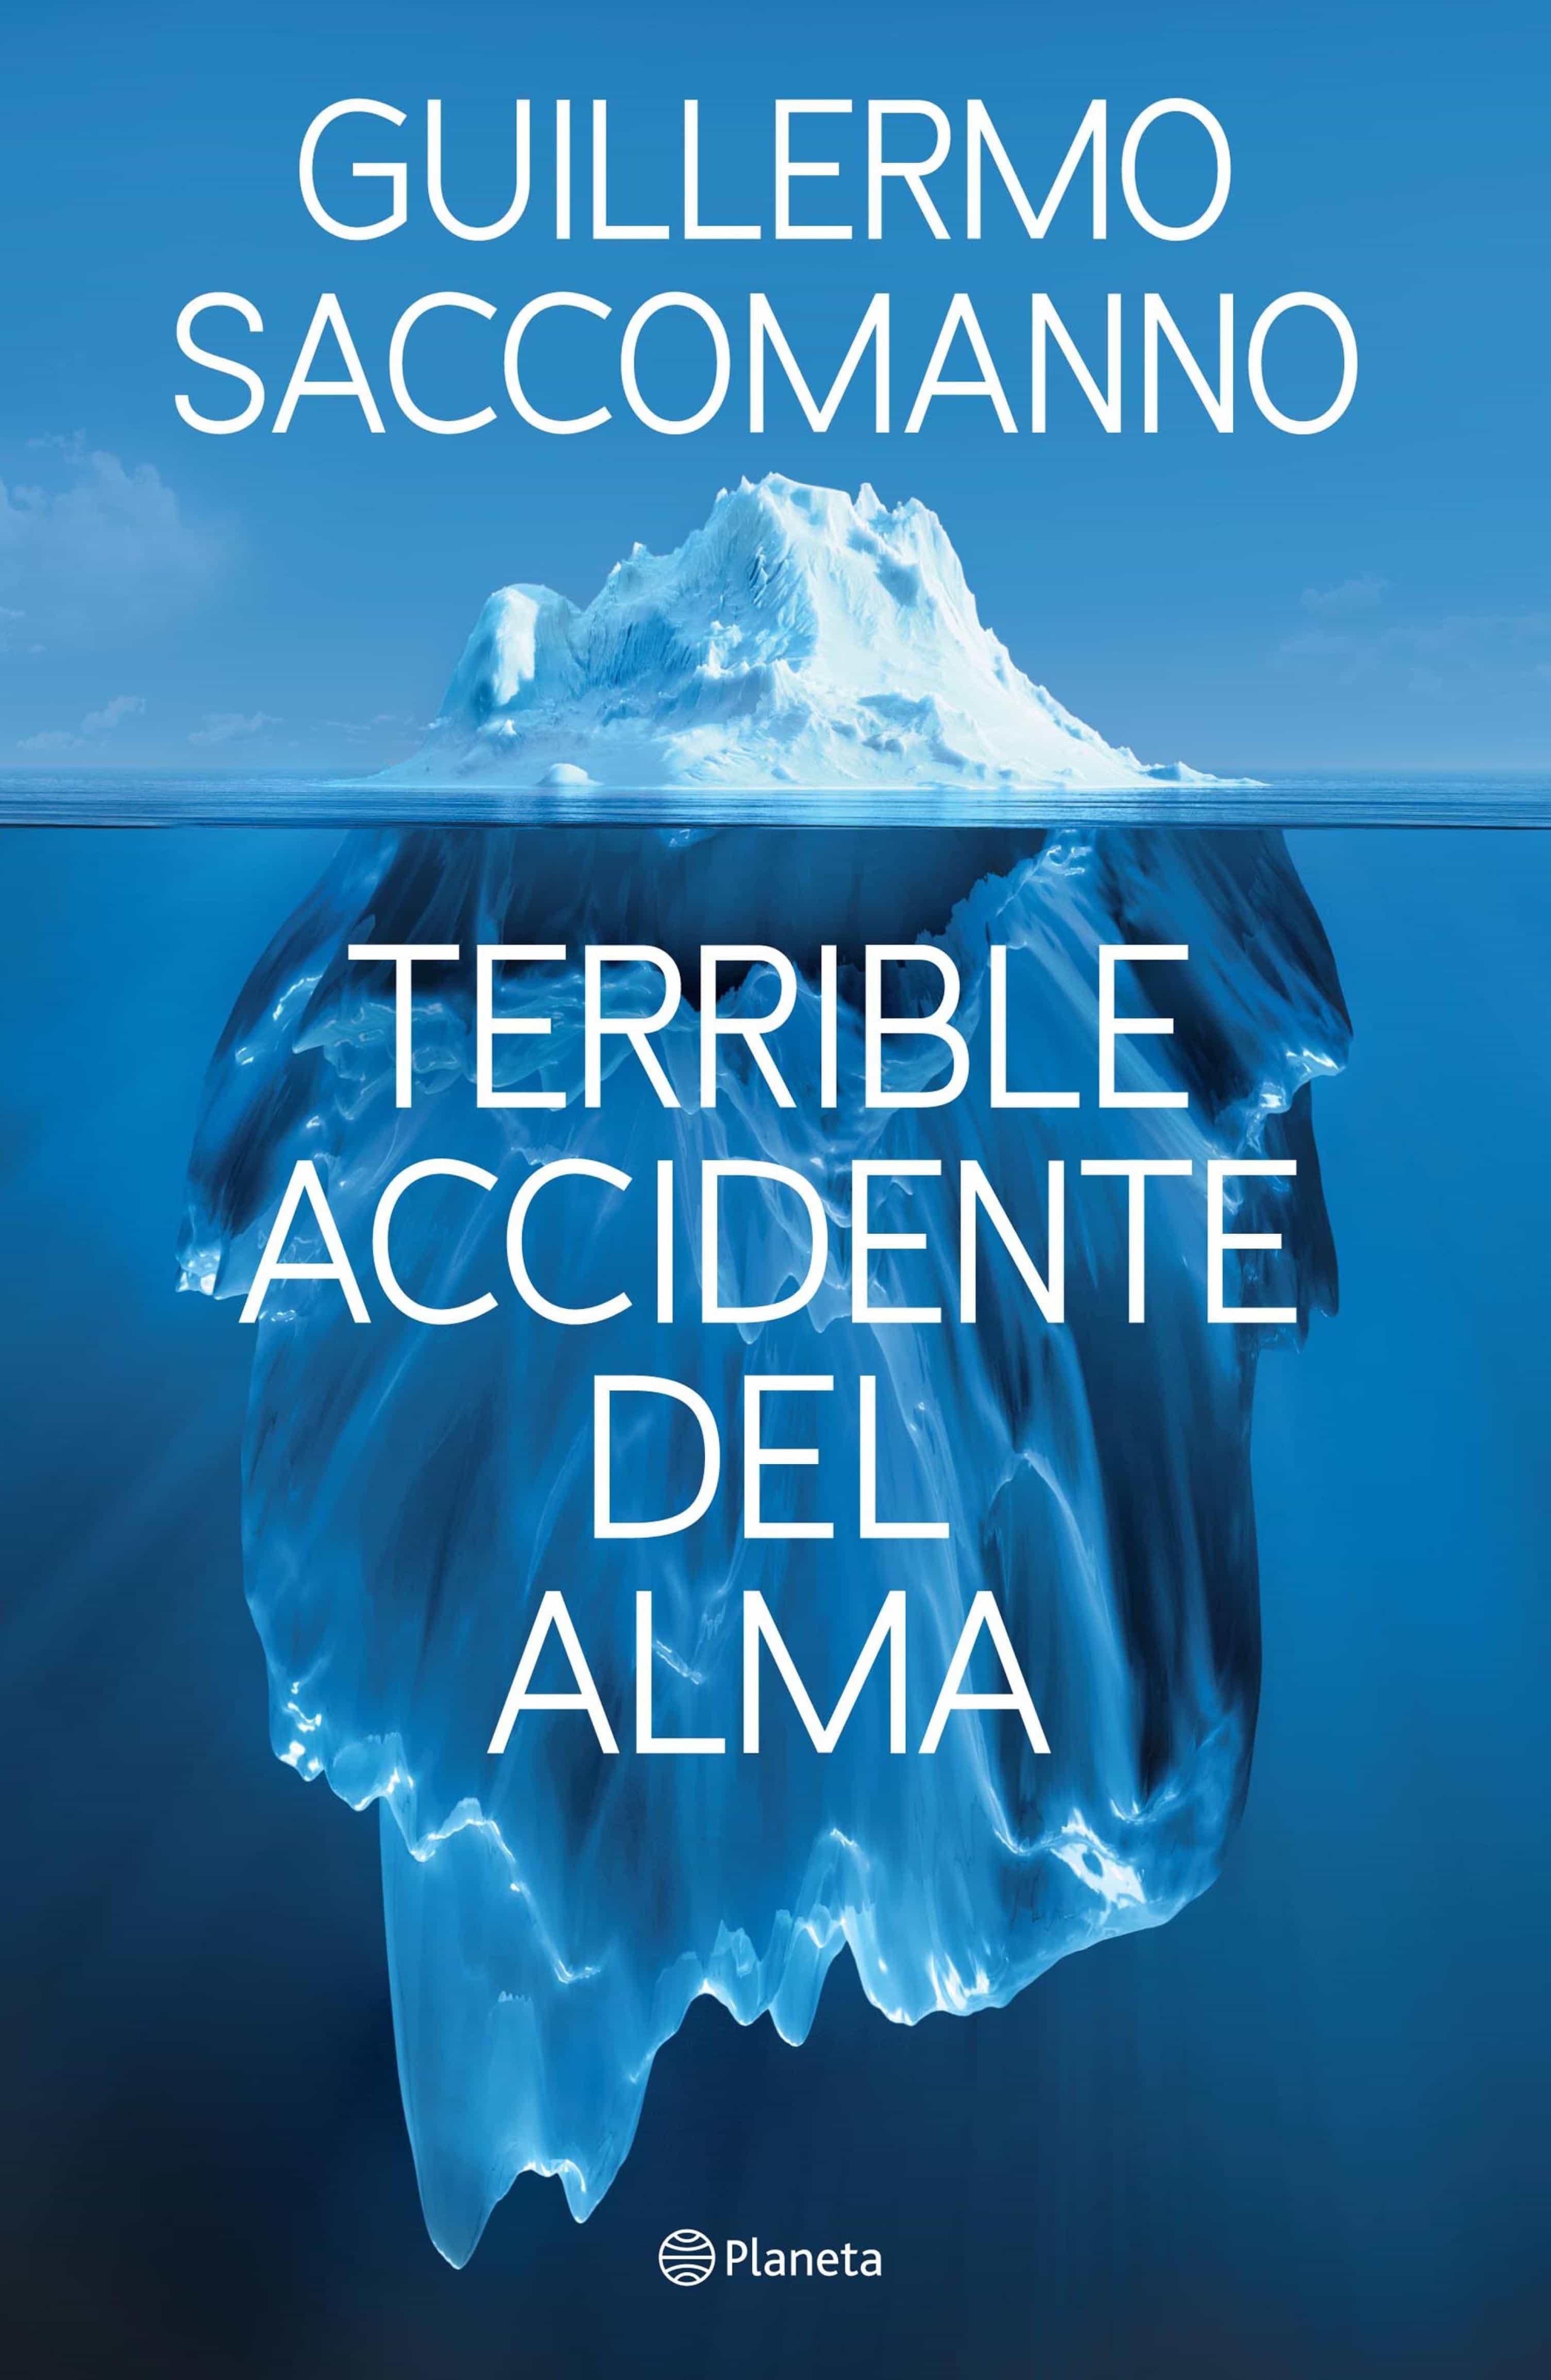 Terrible accidente del alma: Terrible accidente del alma